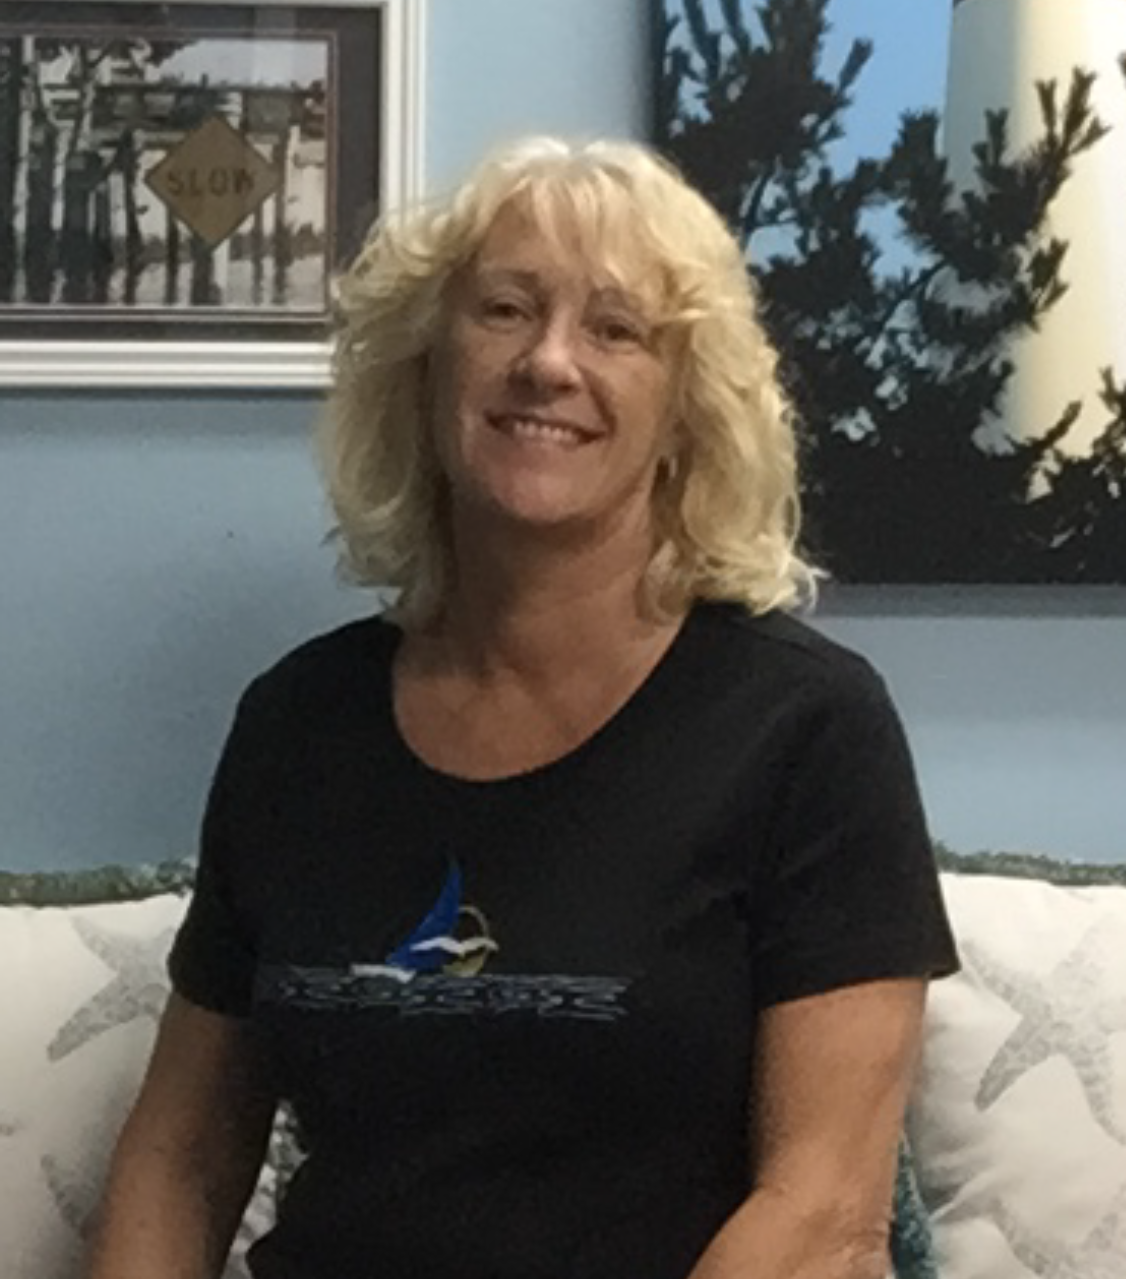 Massage therapist port st lucie florida